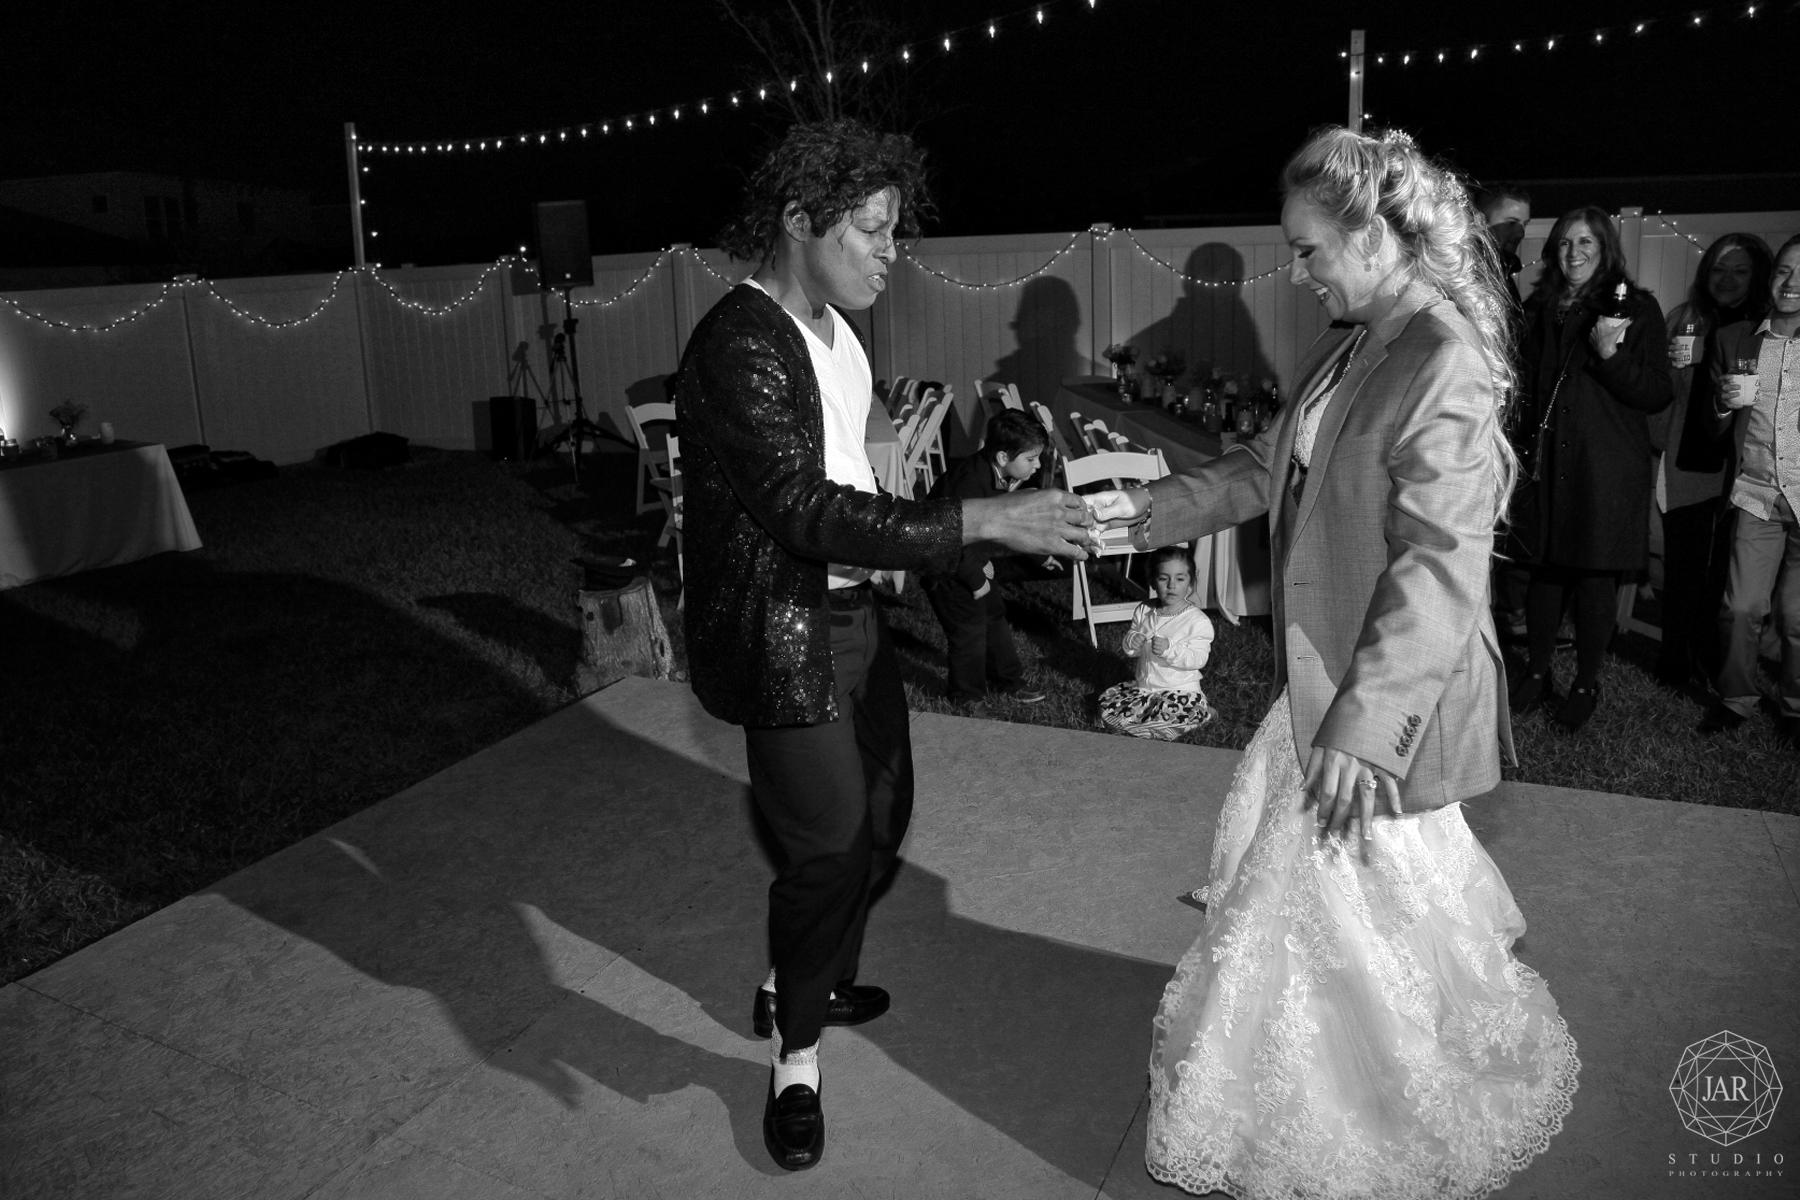 52-wedding-best-party-entertainment-fun-orlando-jarstudio.JPG